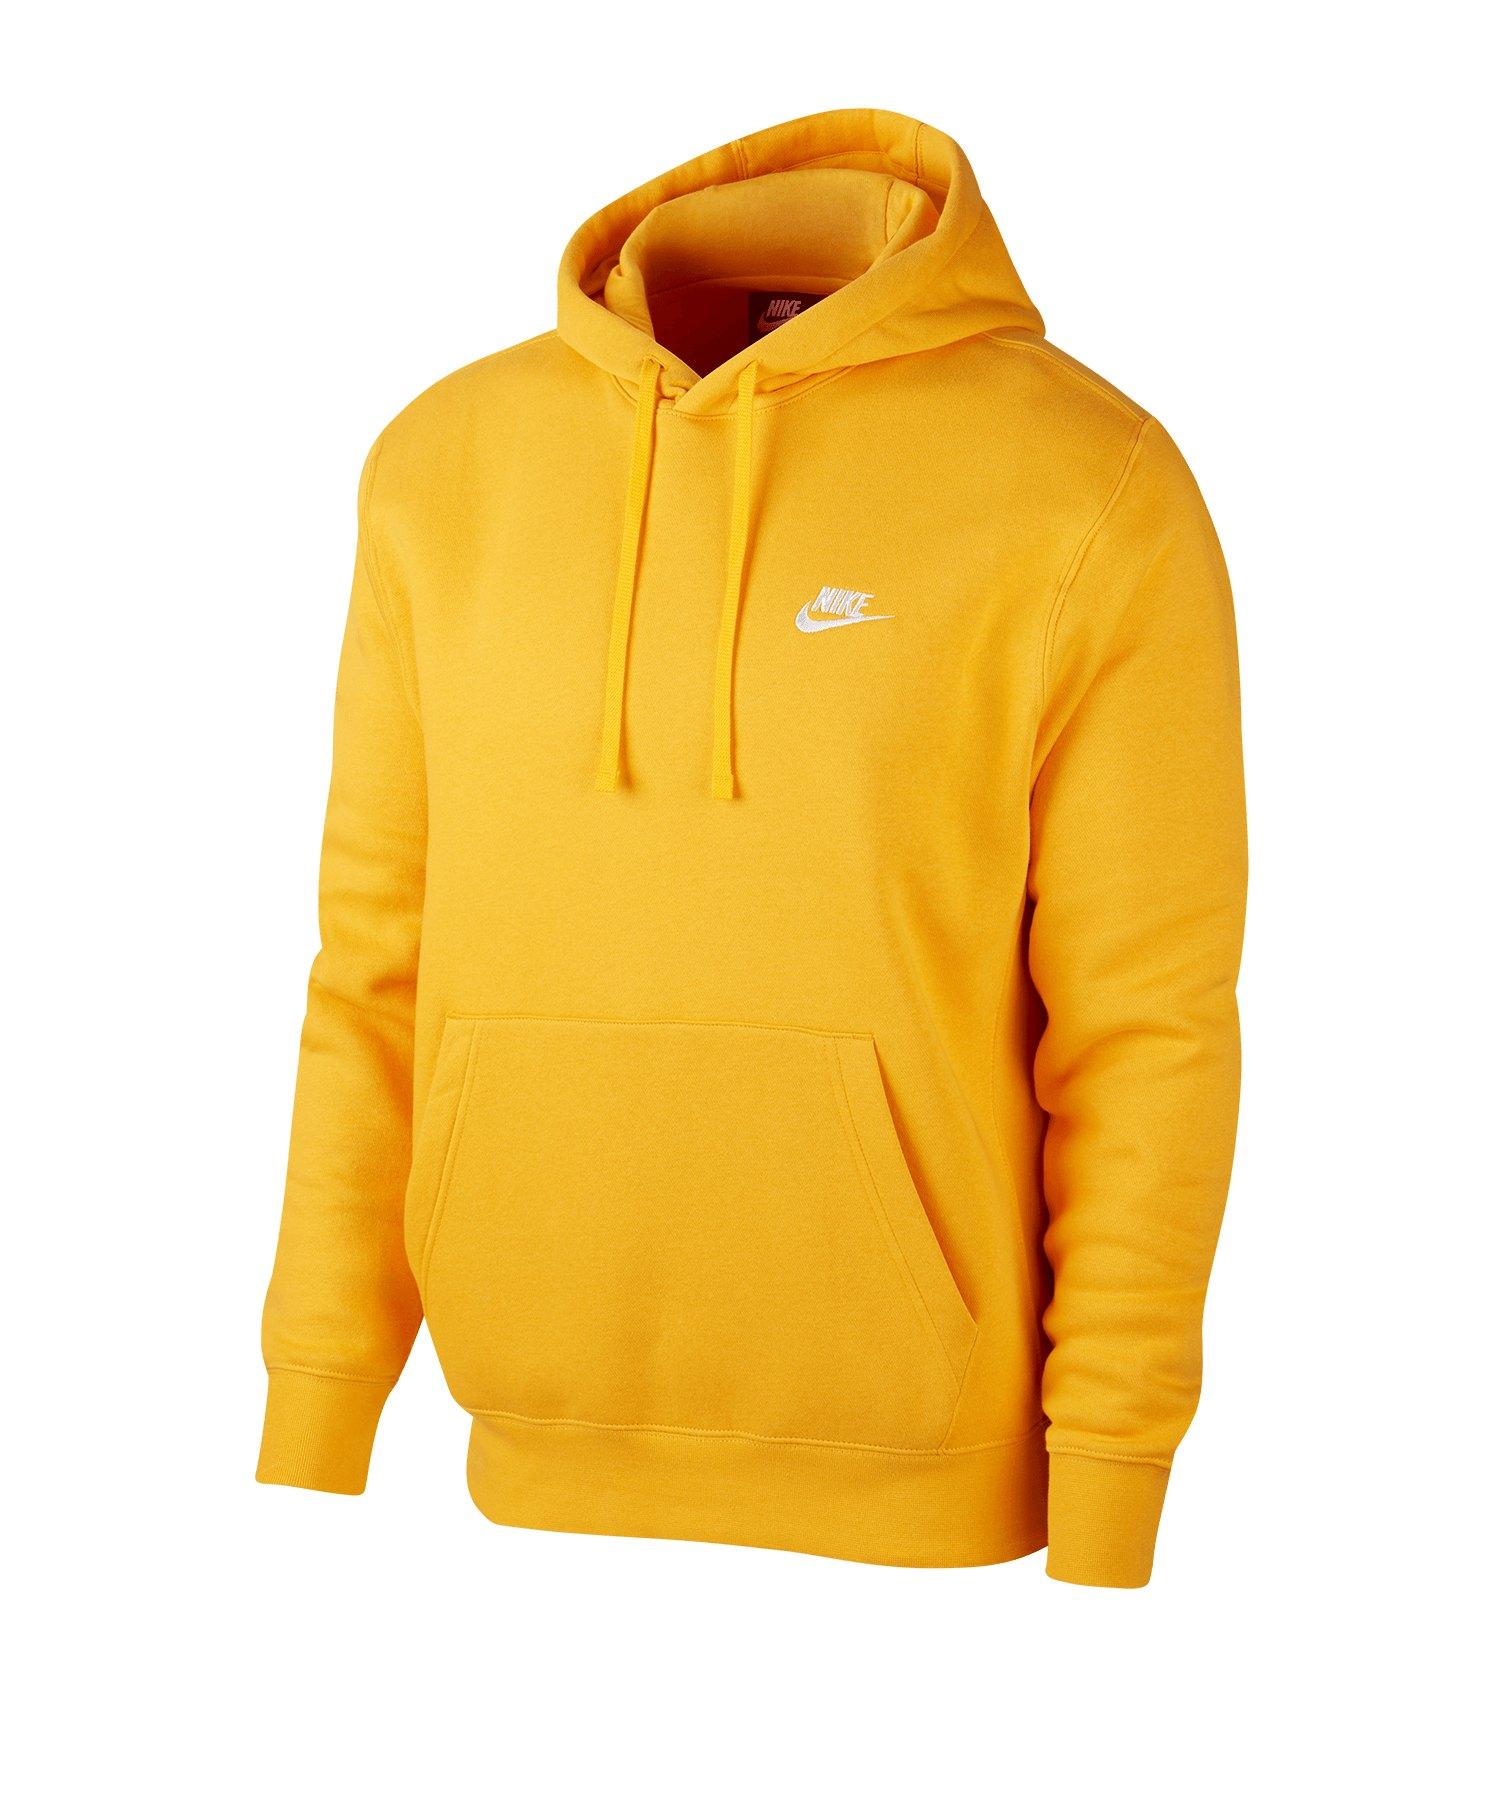 Nike Schweden hoody gelb neu